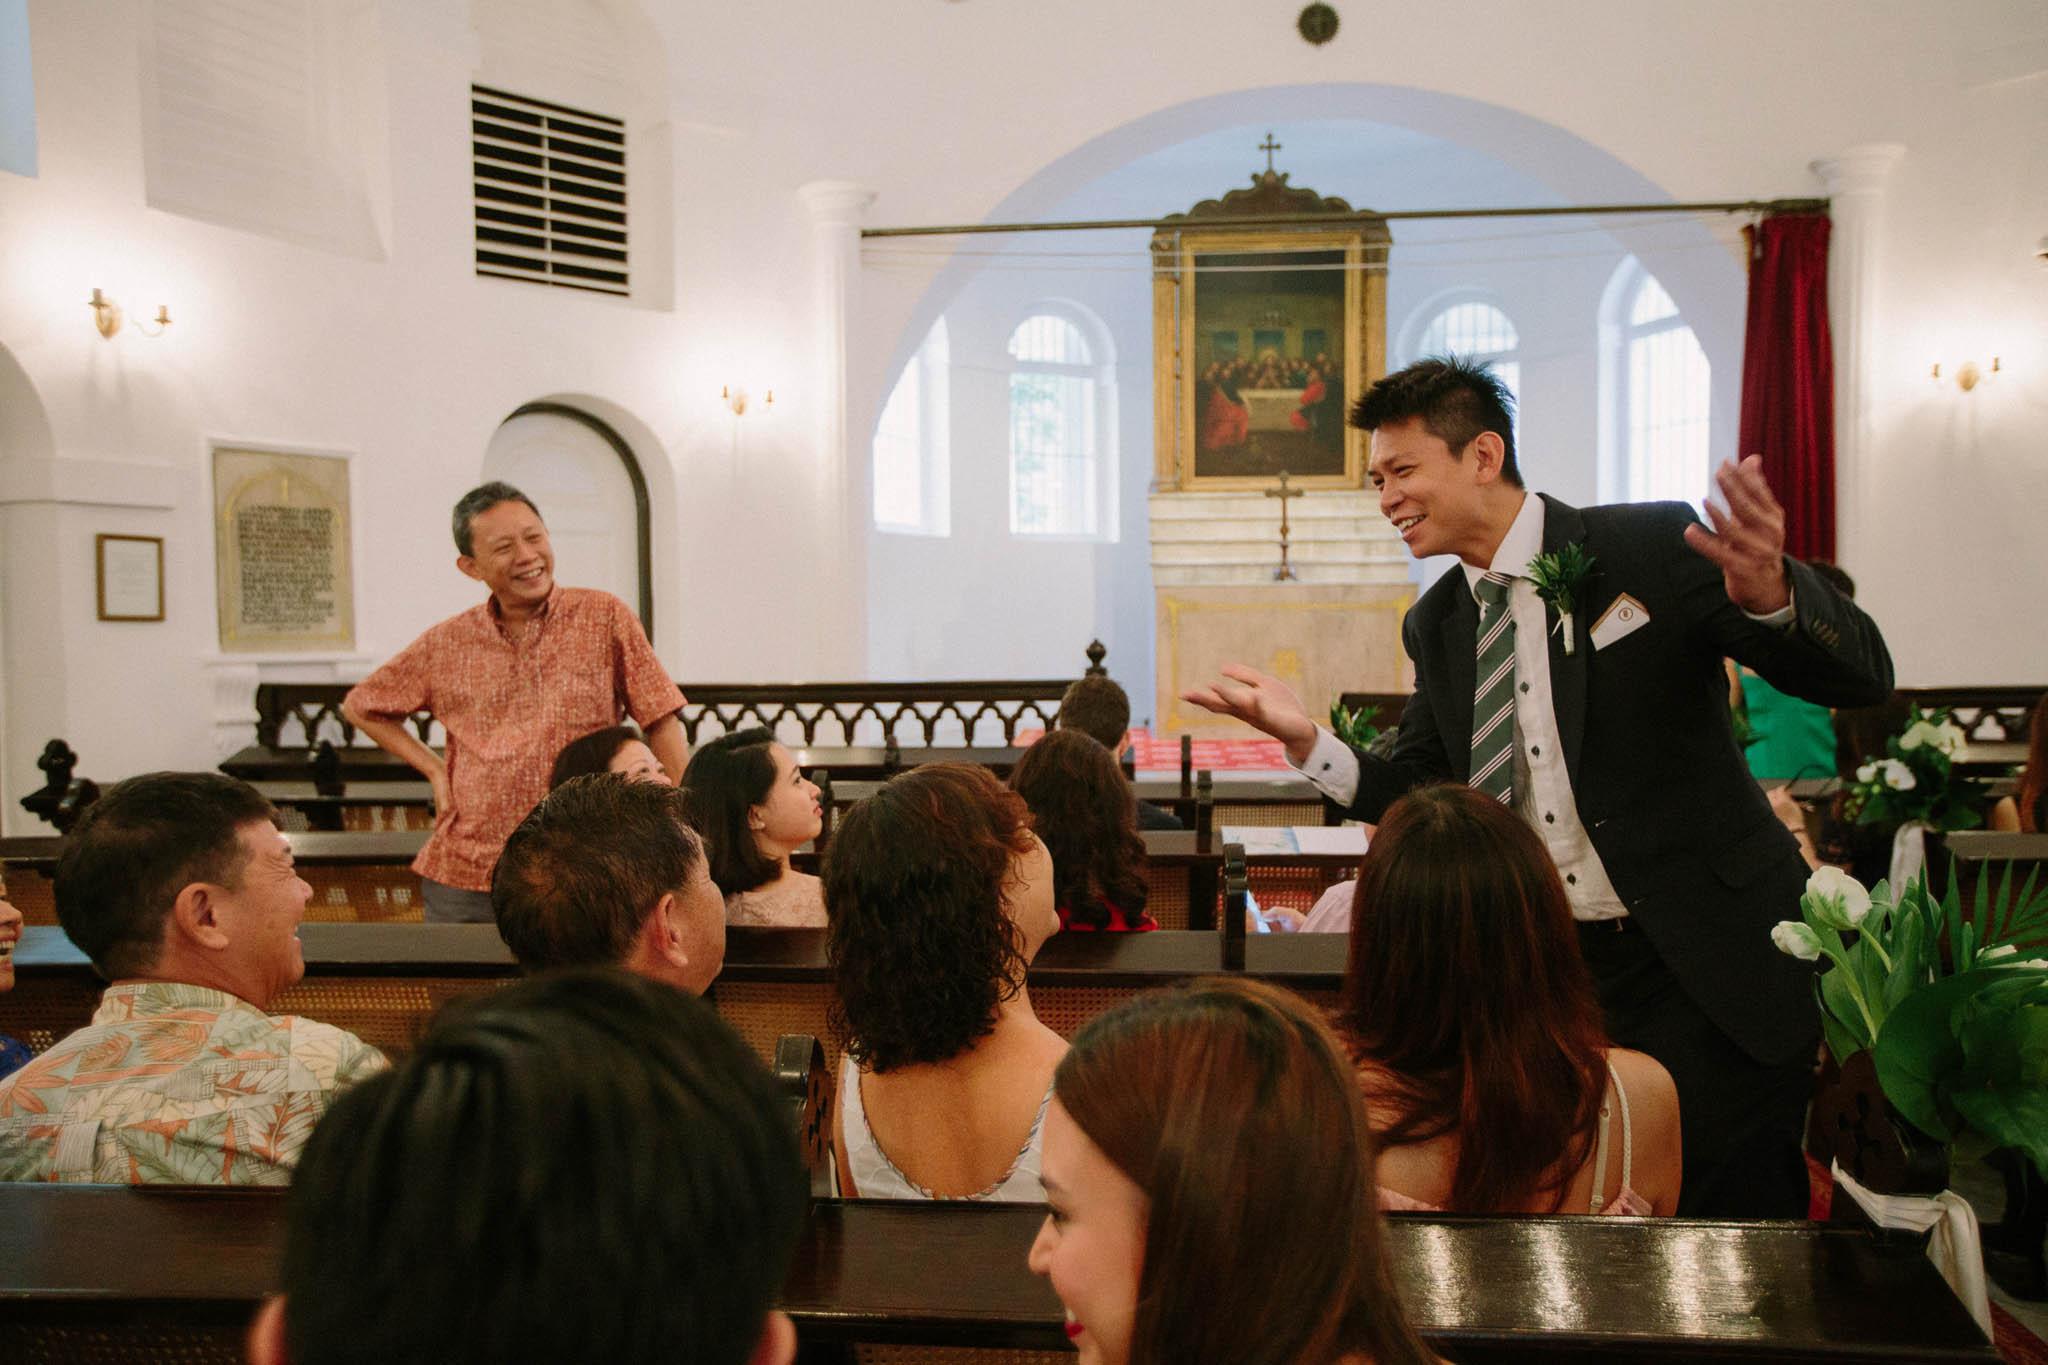 singapore-wedding-photographer-sentosa-foc-mark-eleanor-03.jpg